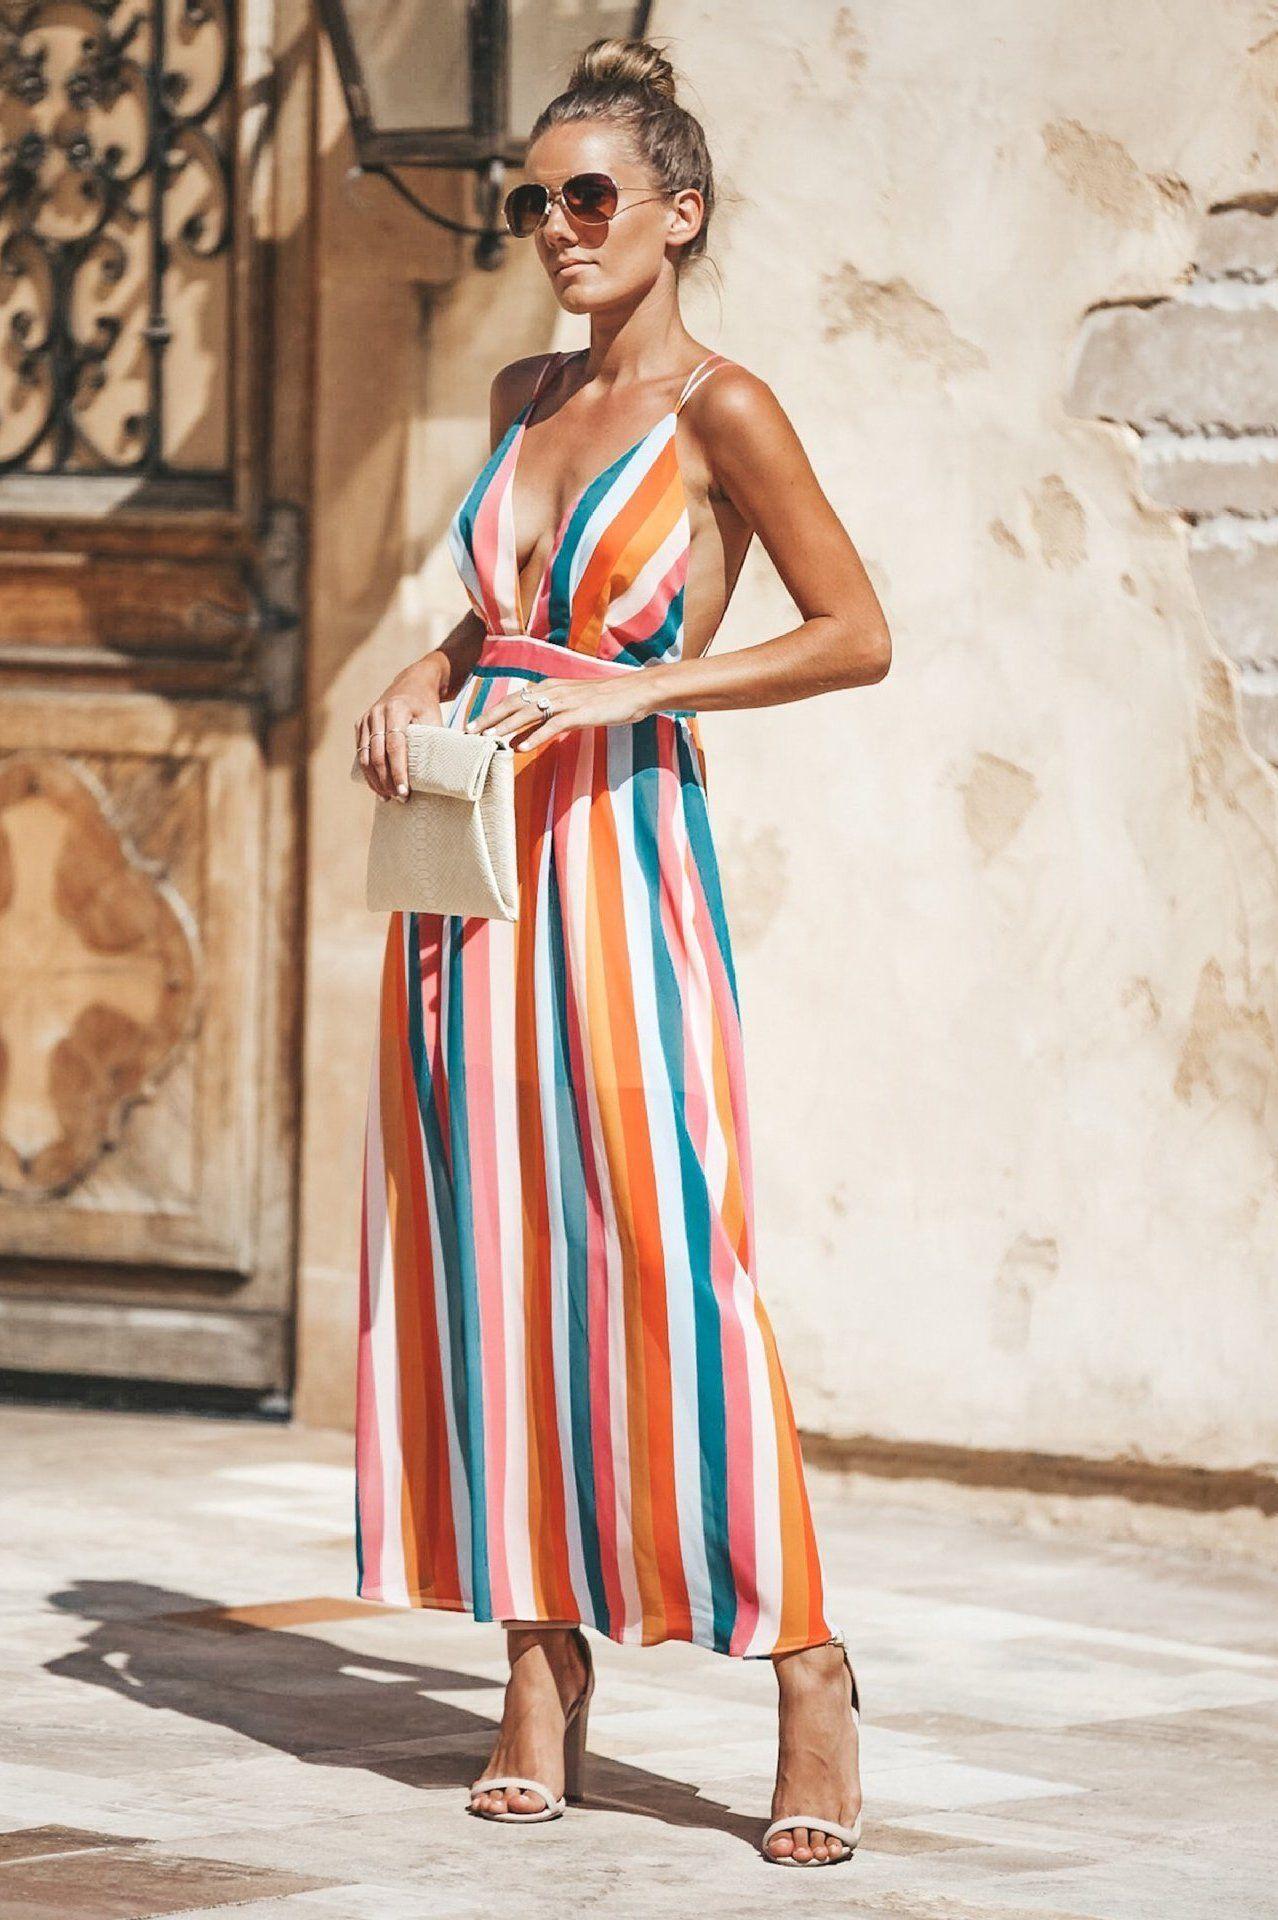 6d4d5d6379f8 V Neck Backless Striped Colorful Rainbow Sleeveless Sleeveless Party Dress  Maxi Dress #design #amazing #shopping #fashion #hashtag #stylish #style ...